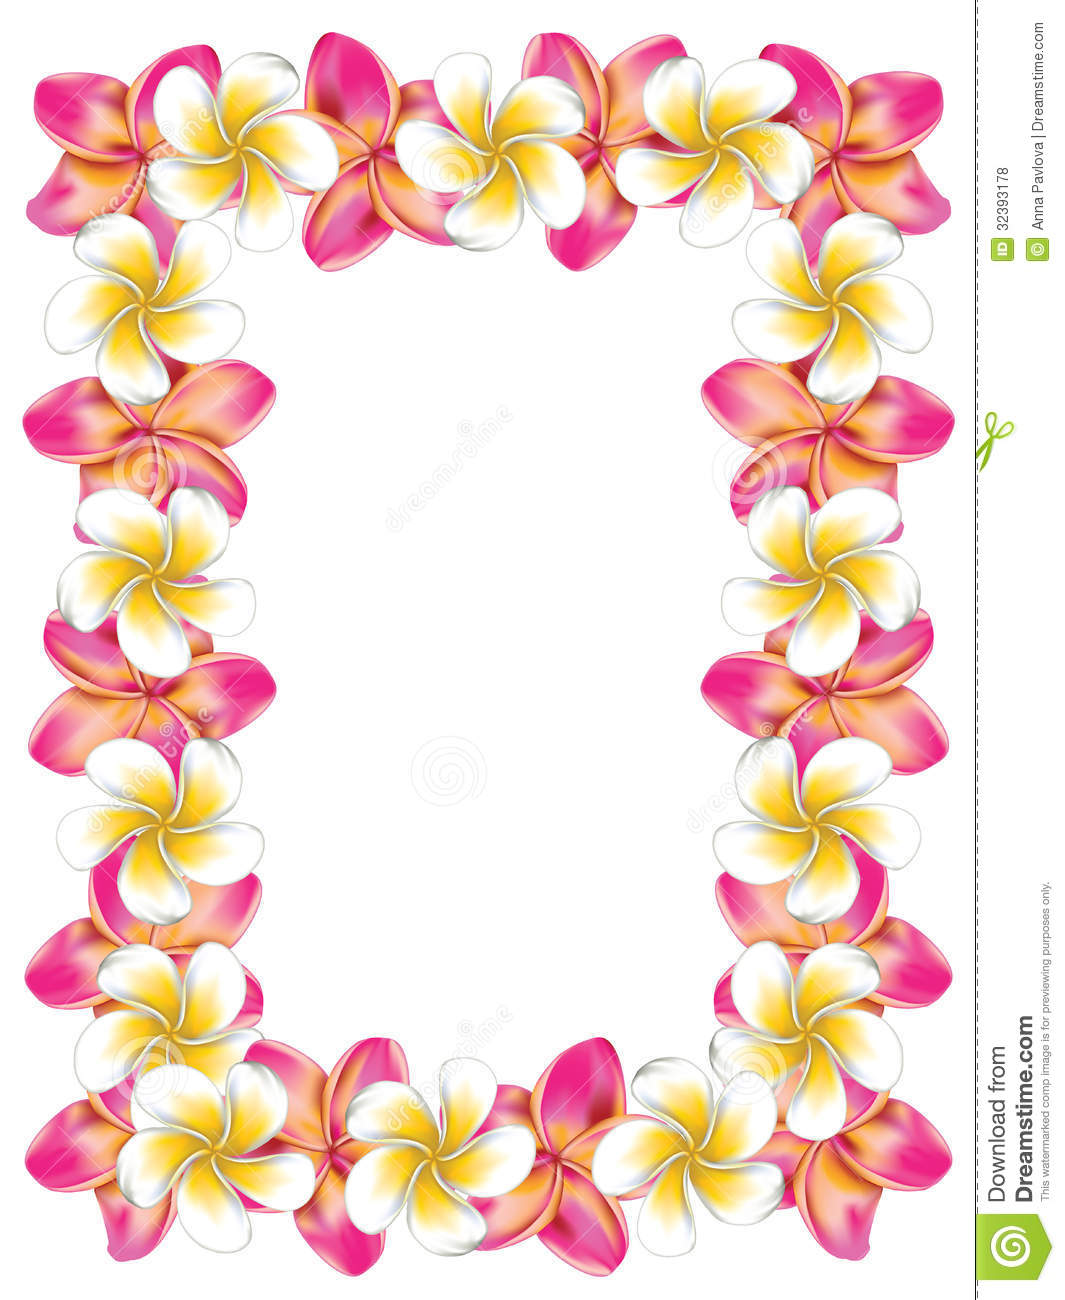 Hawaiian flower clip art borders clipart panda free clipart images hawaiian20clip20art20borders izmirmasajfo Image collections